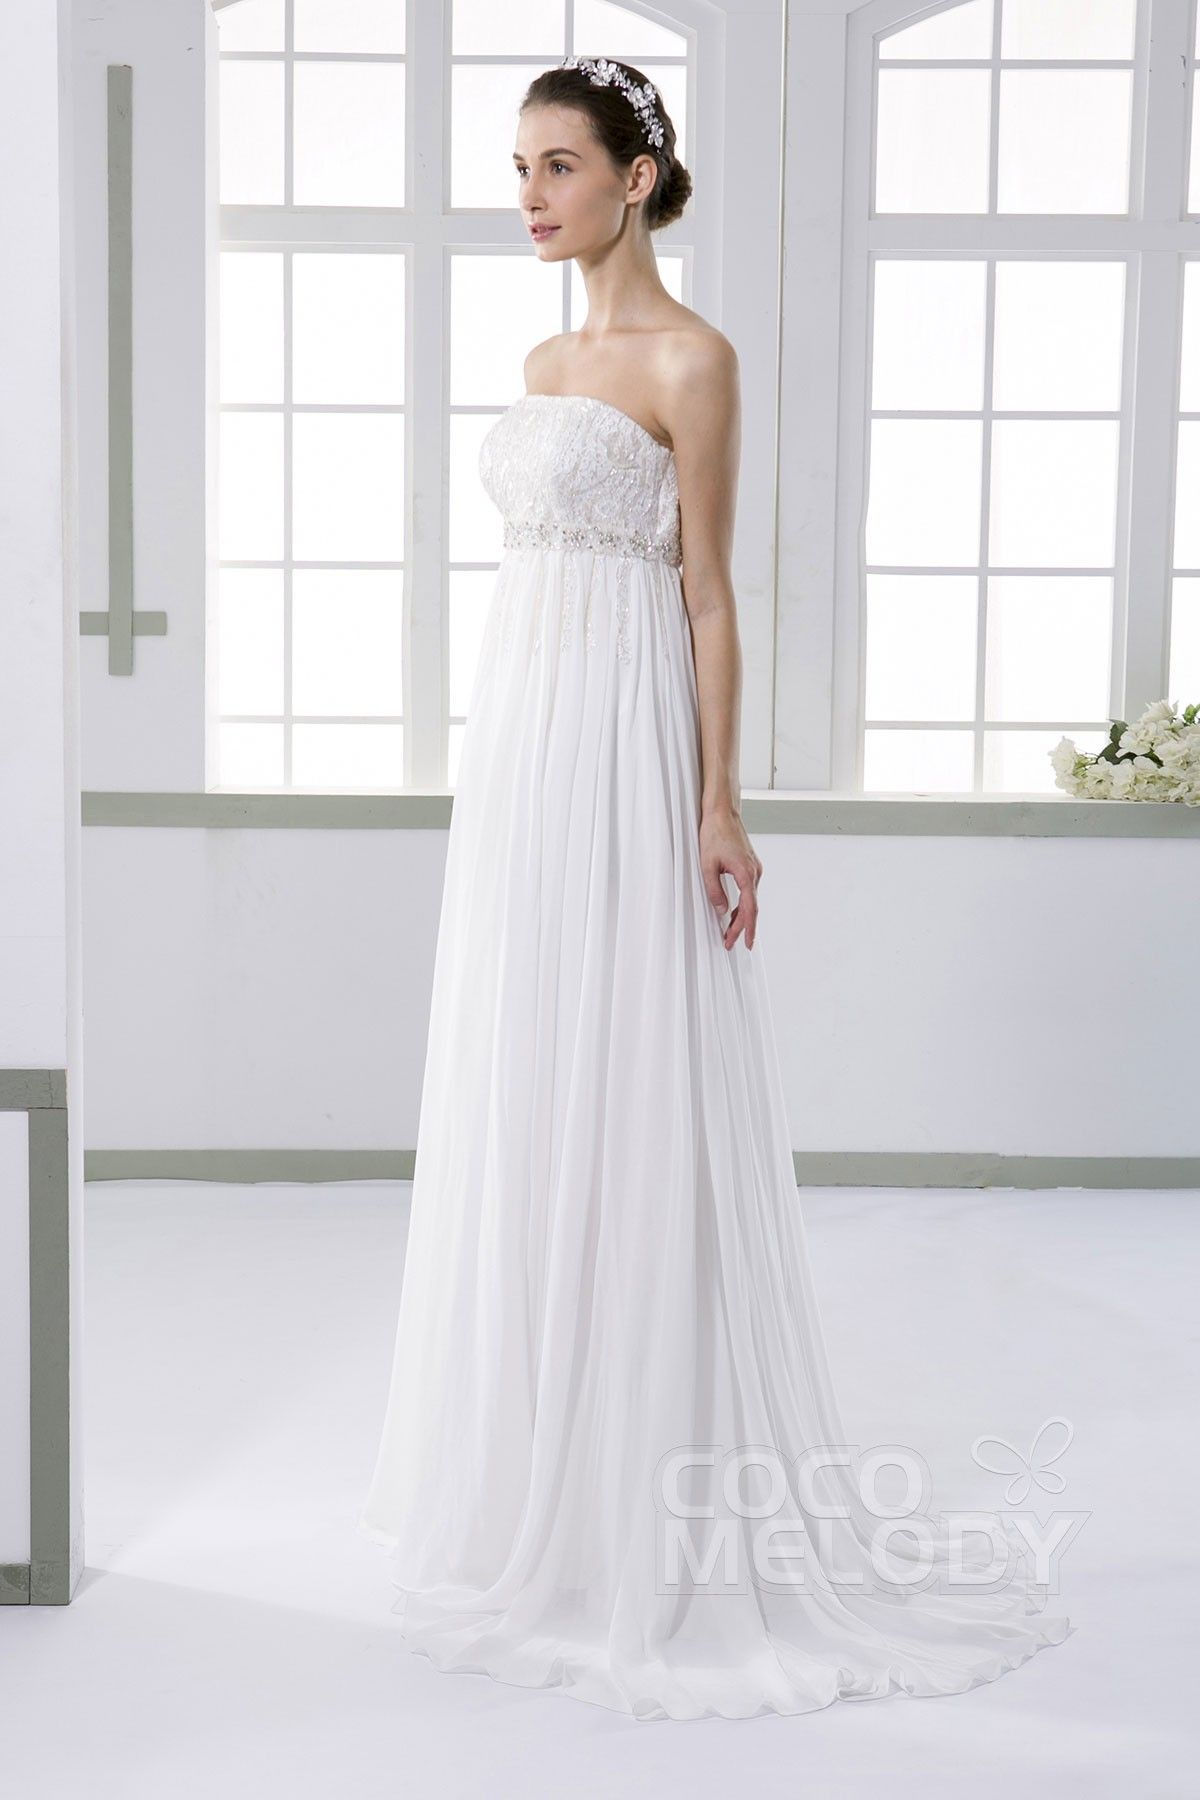 Strapless Empire Wedding Dresses